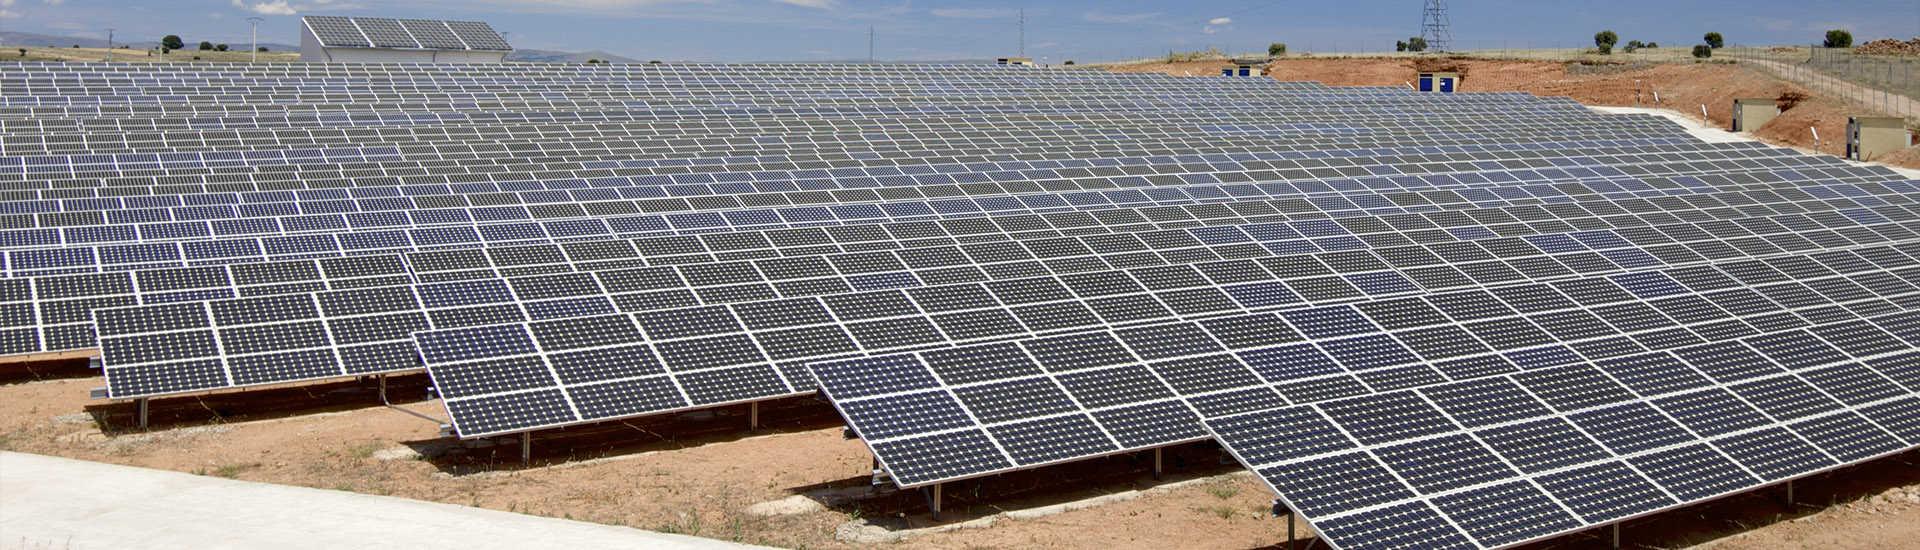 zonnepanelen overheid